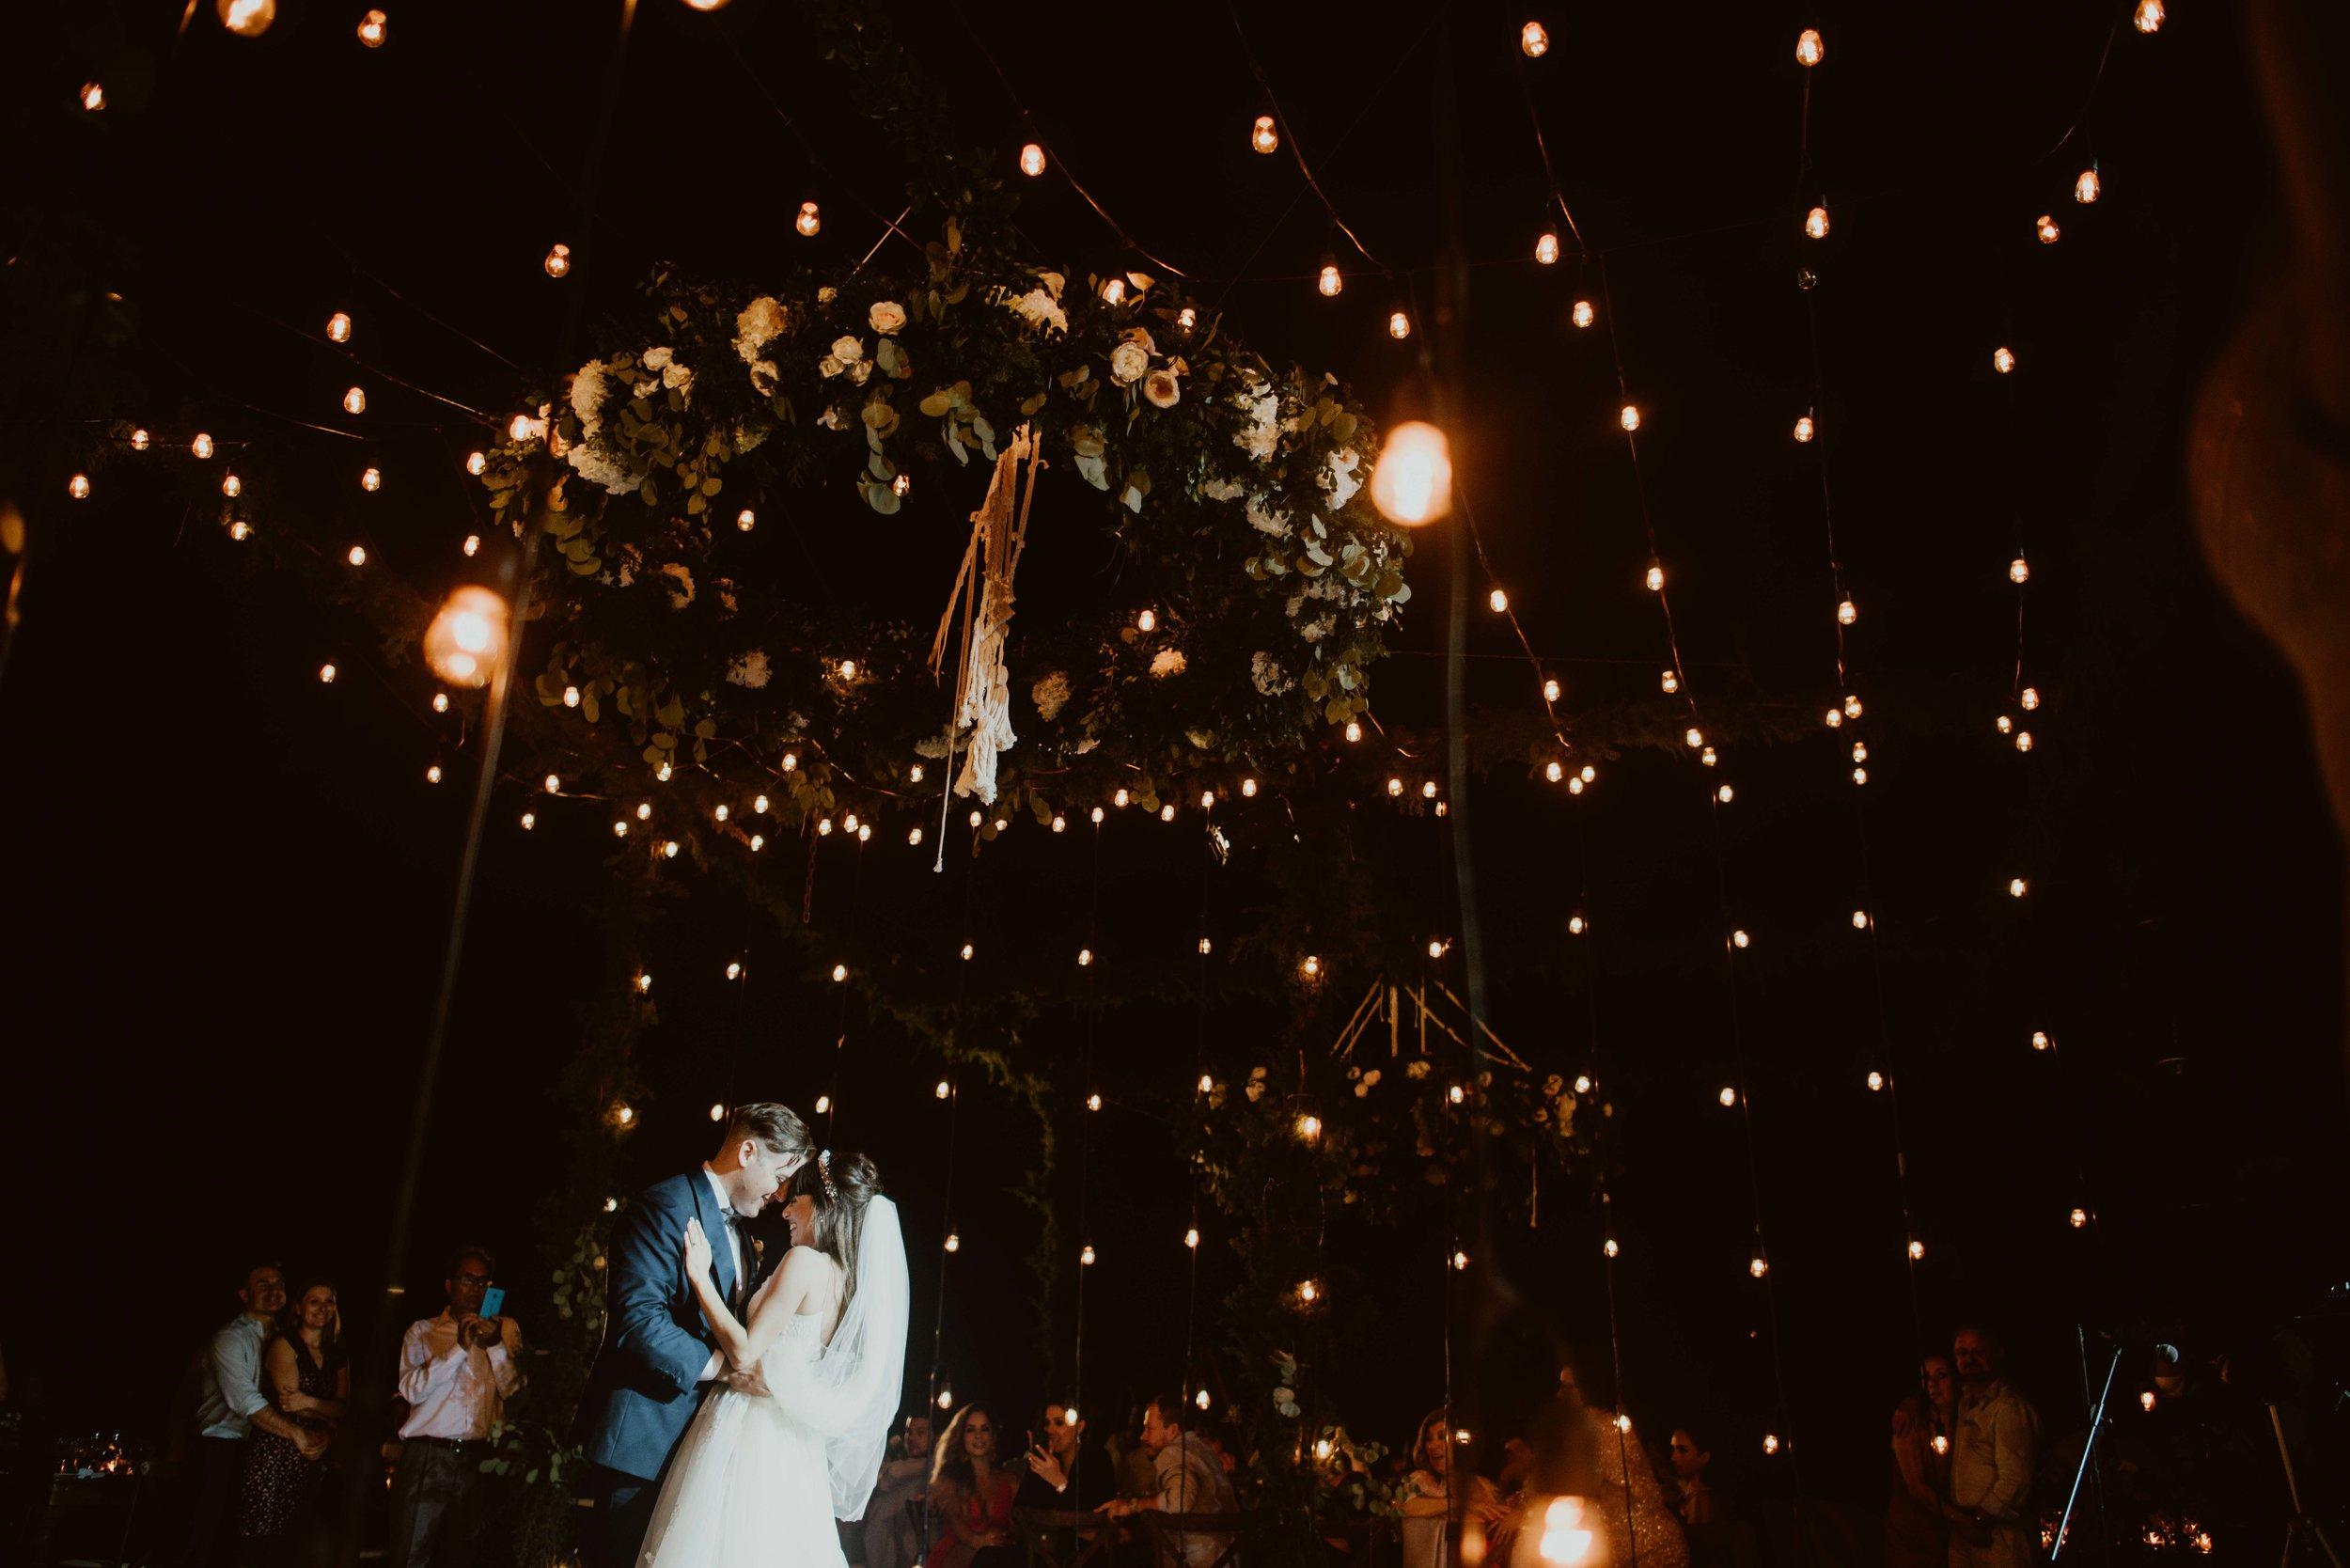 Mariana+Blake Sayulita Wedding-415.jpg